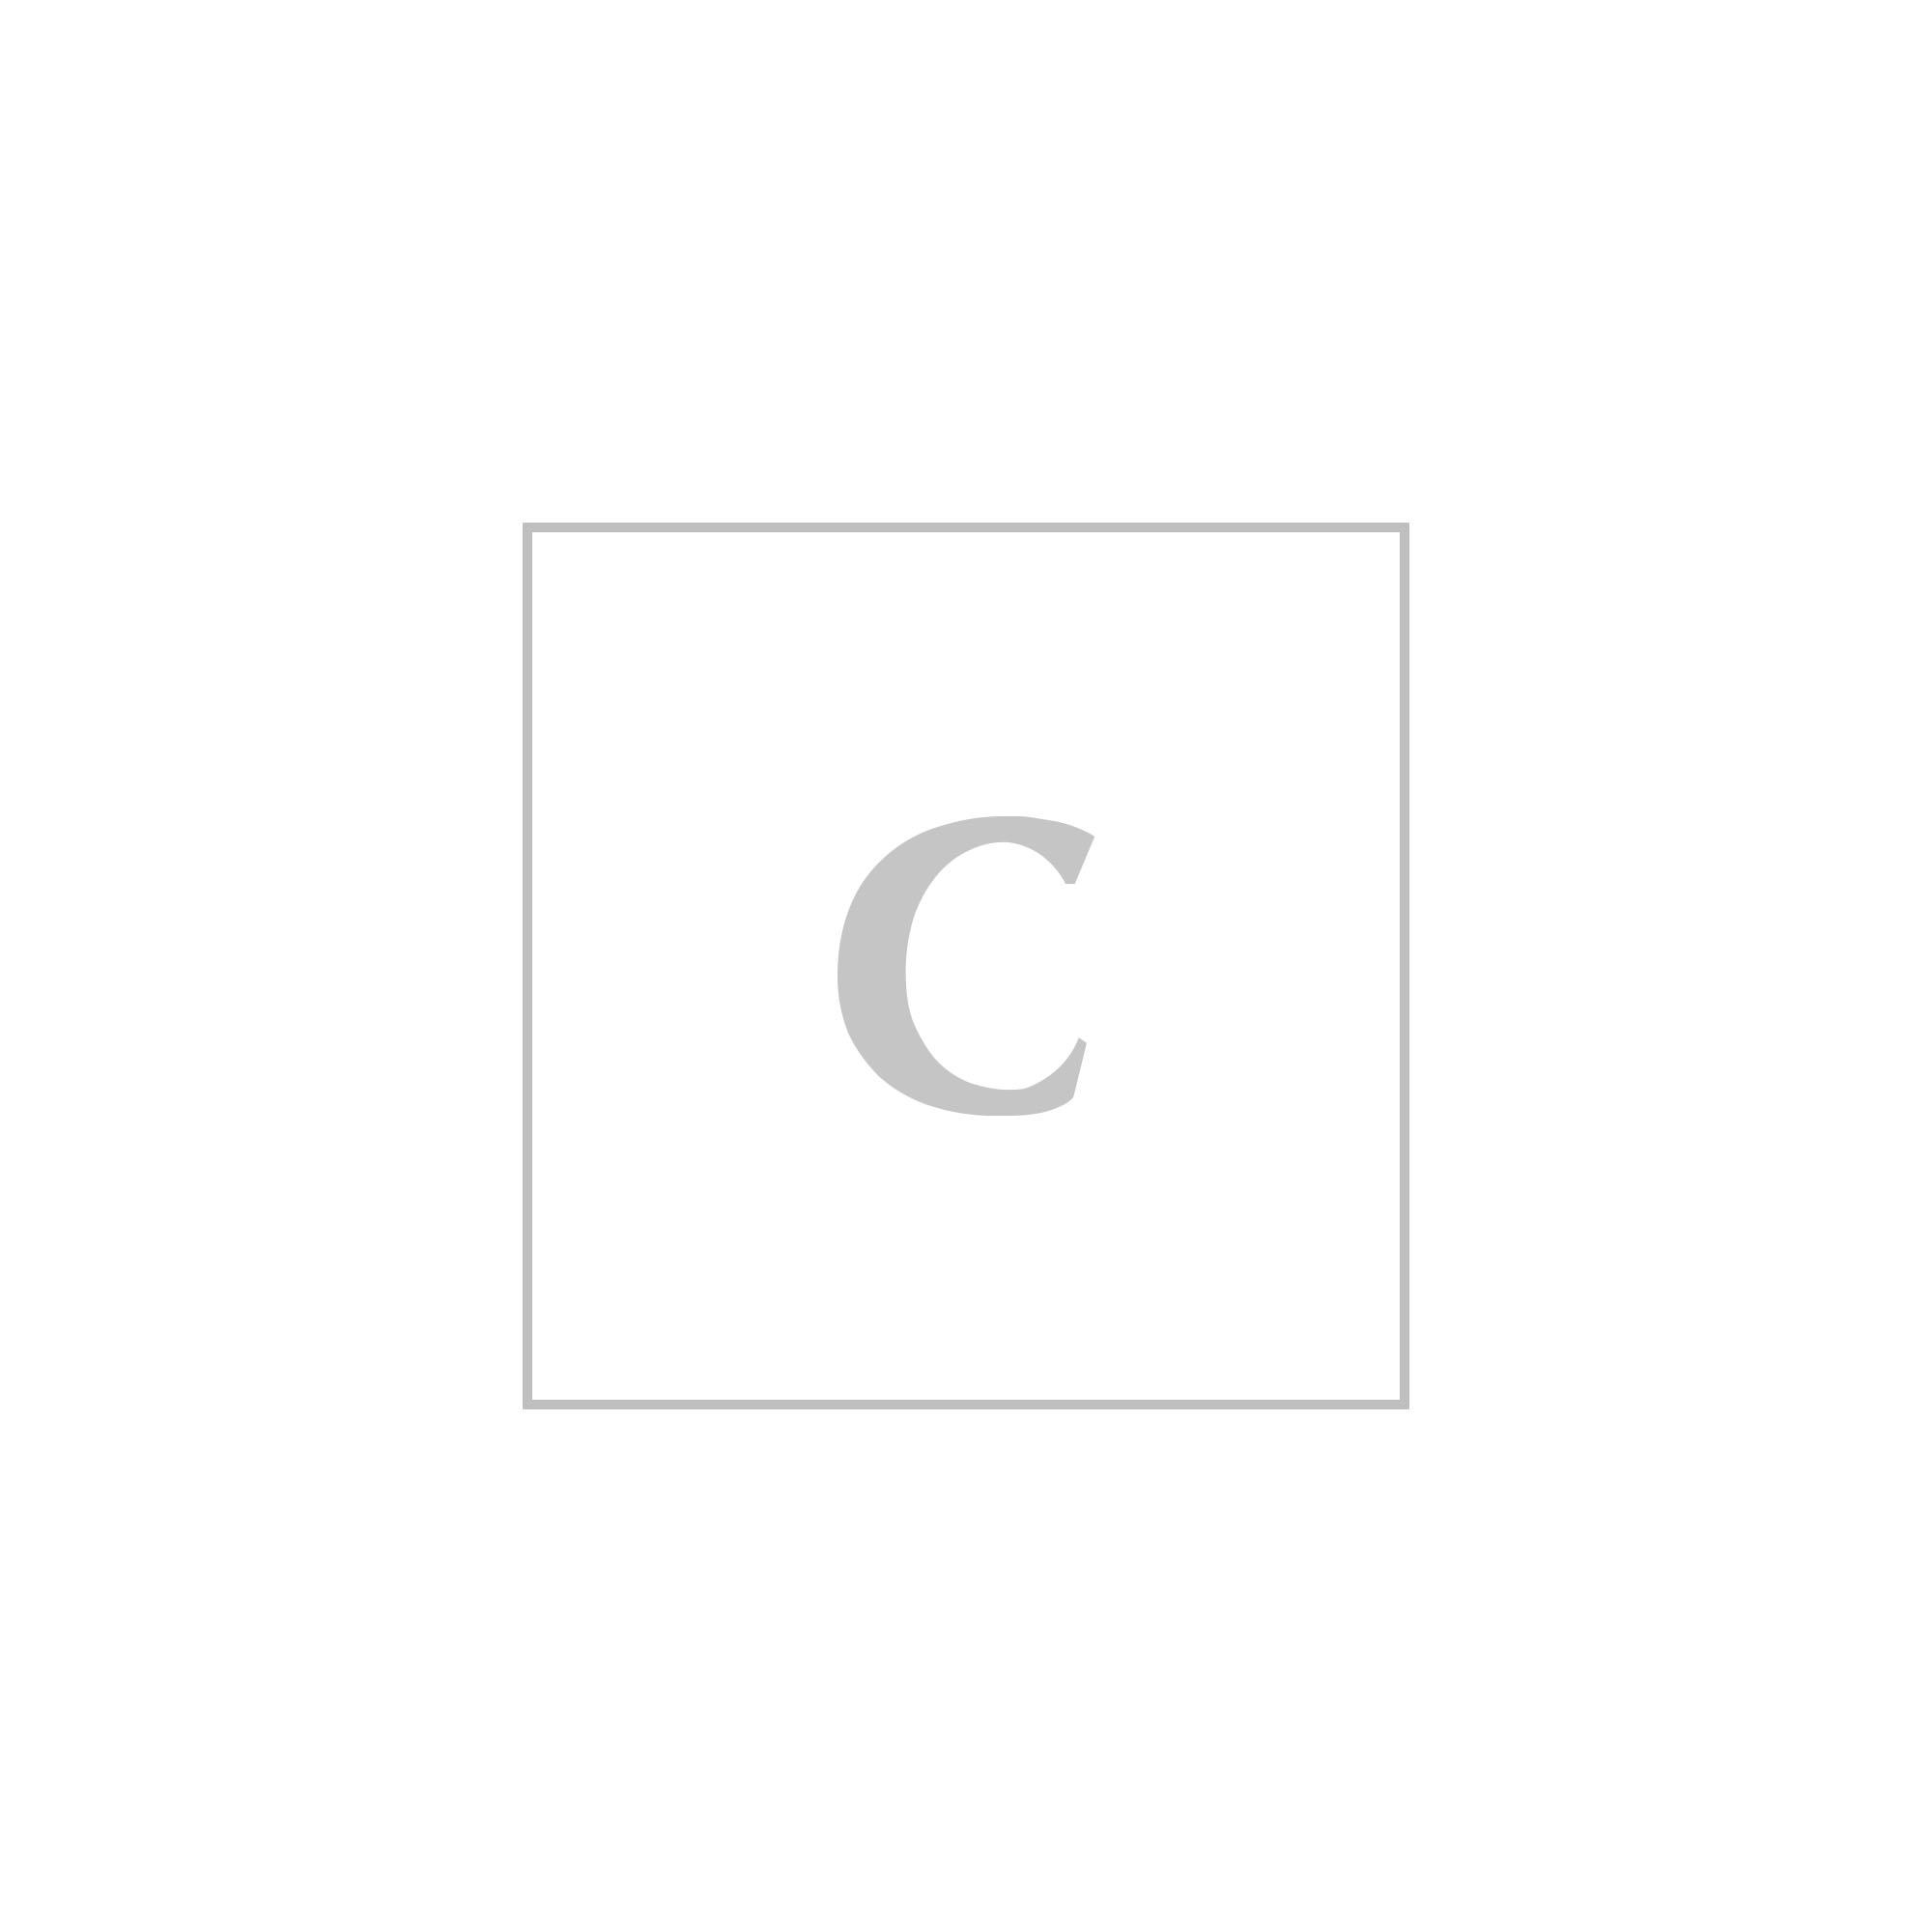 4acb6f56b5 Fendi fendi stamp beltbag